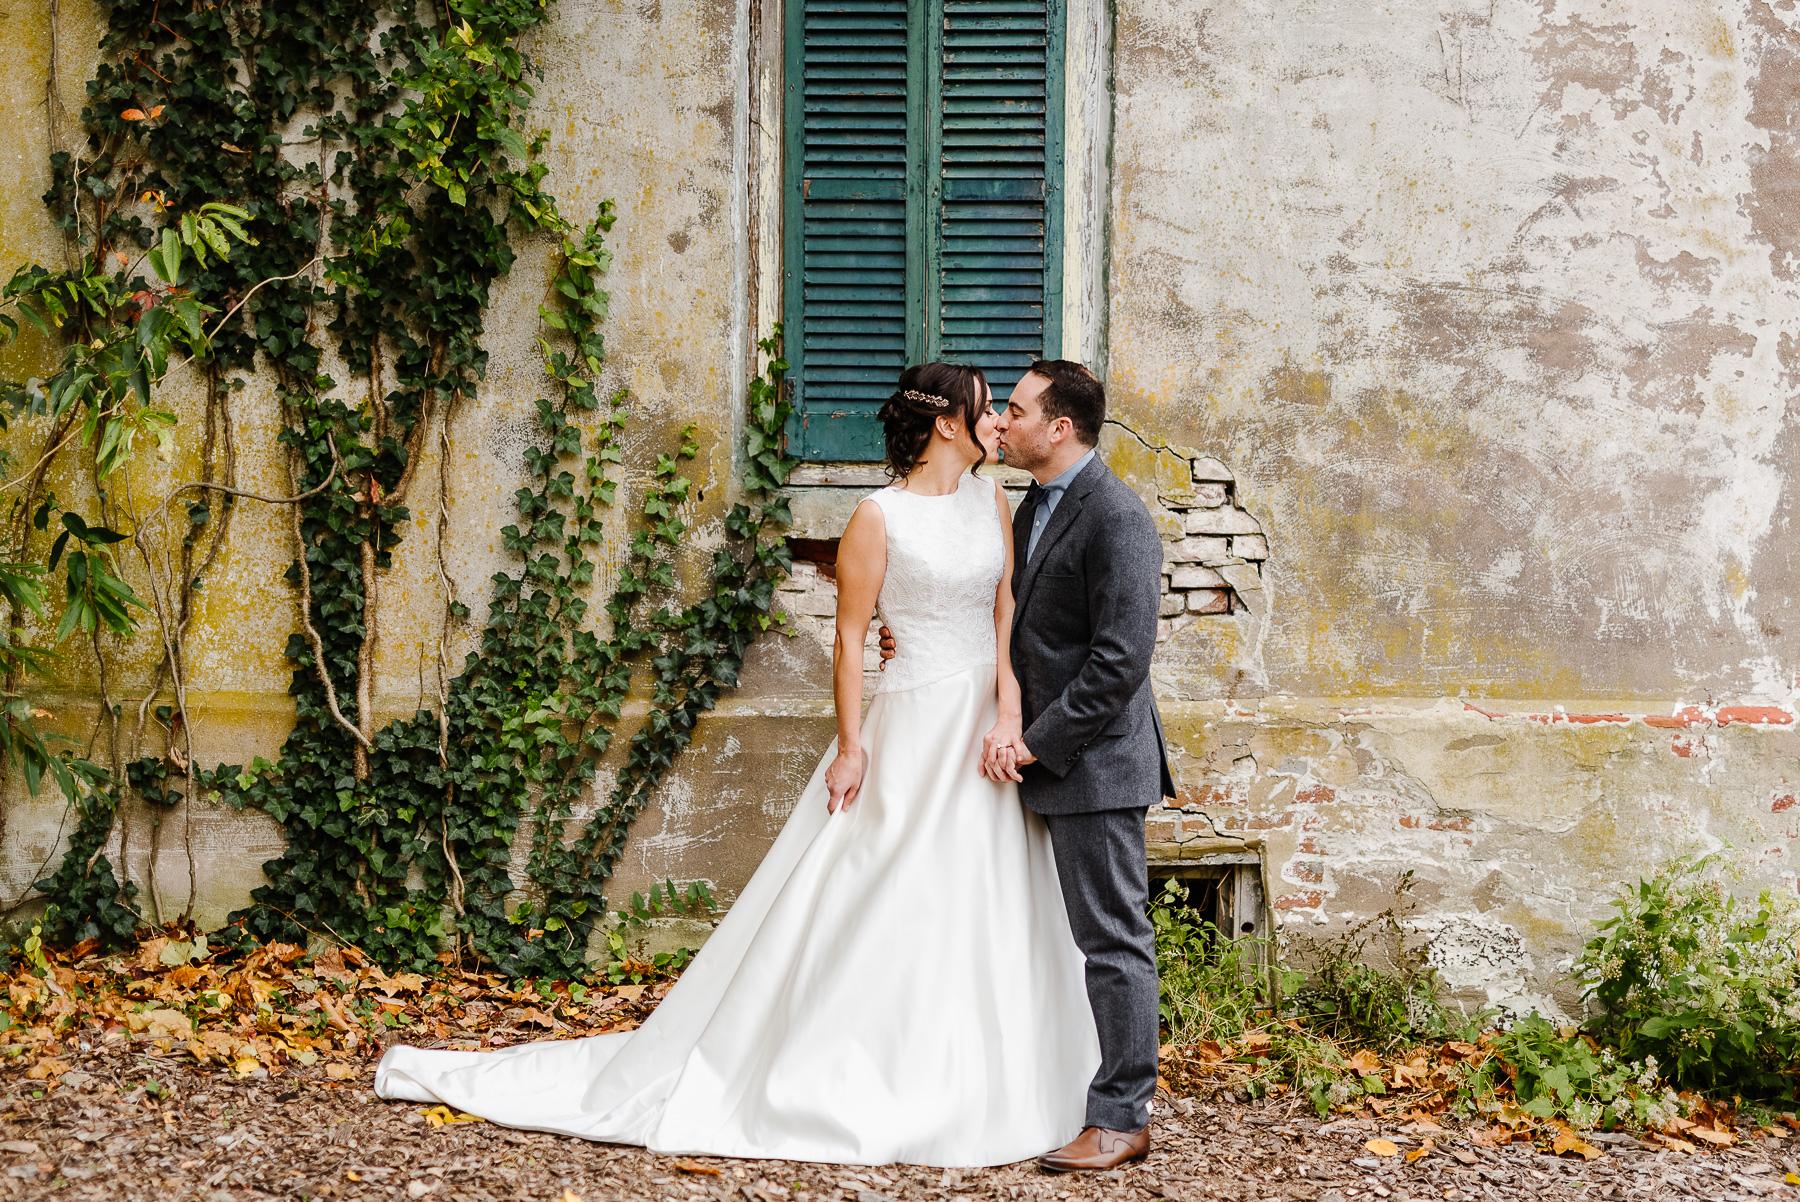 25-Laurita Winery Wedding New Jersey Wedding Photographer Laurita Winery Weddings Longbrook Photography.jpg